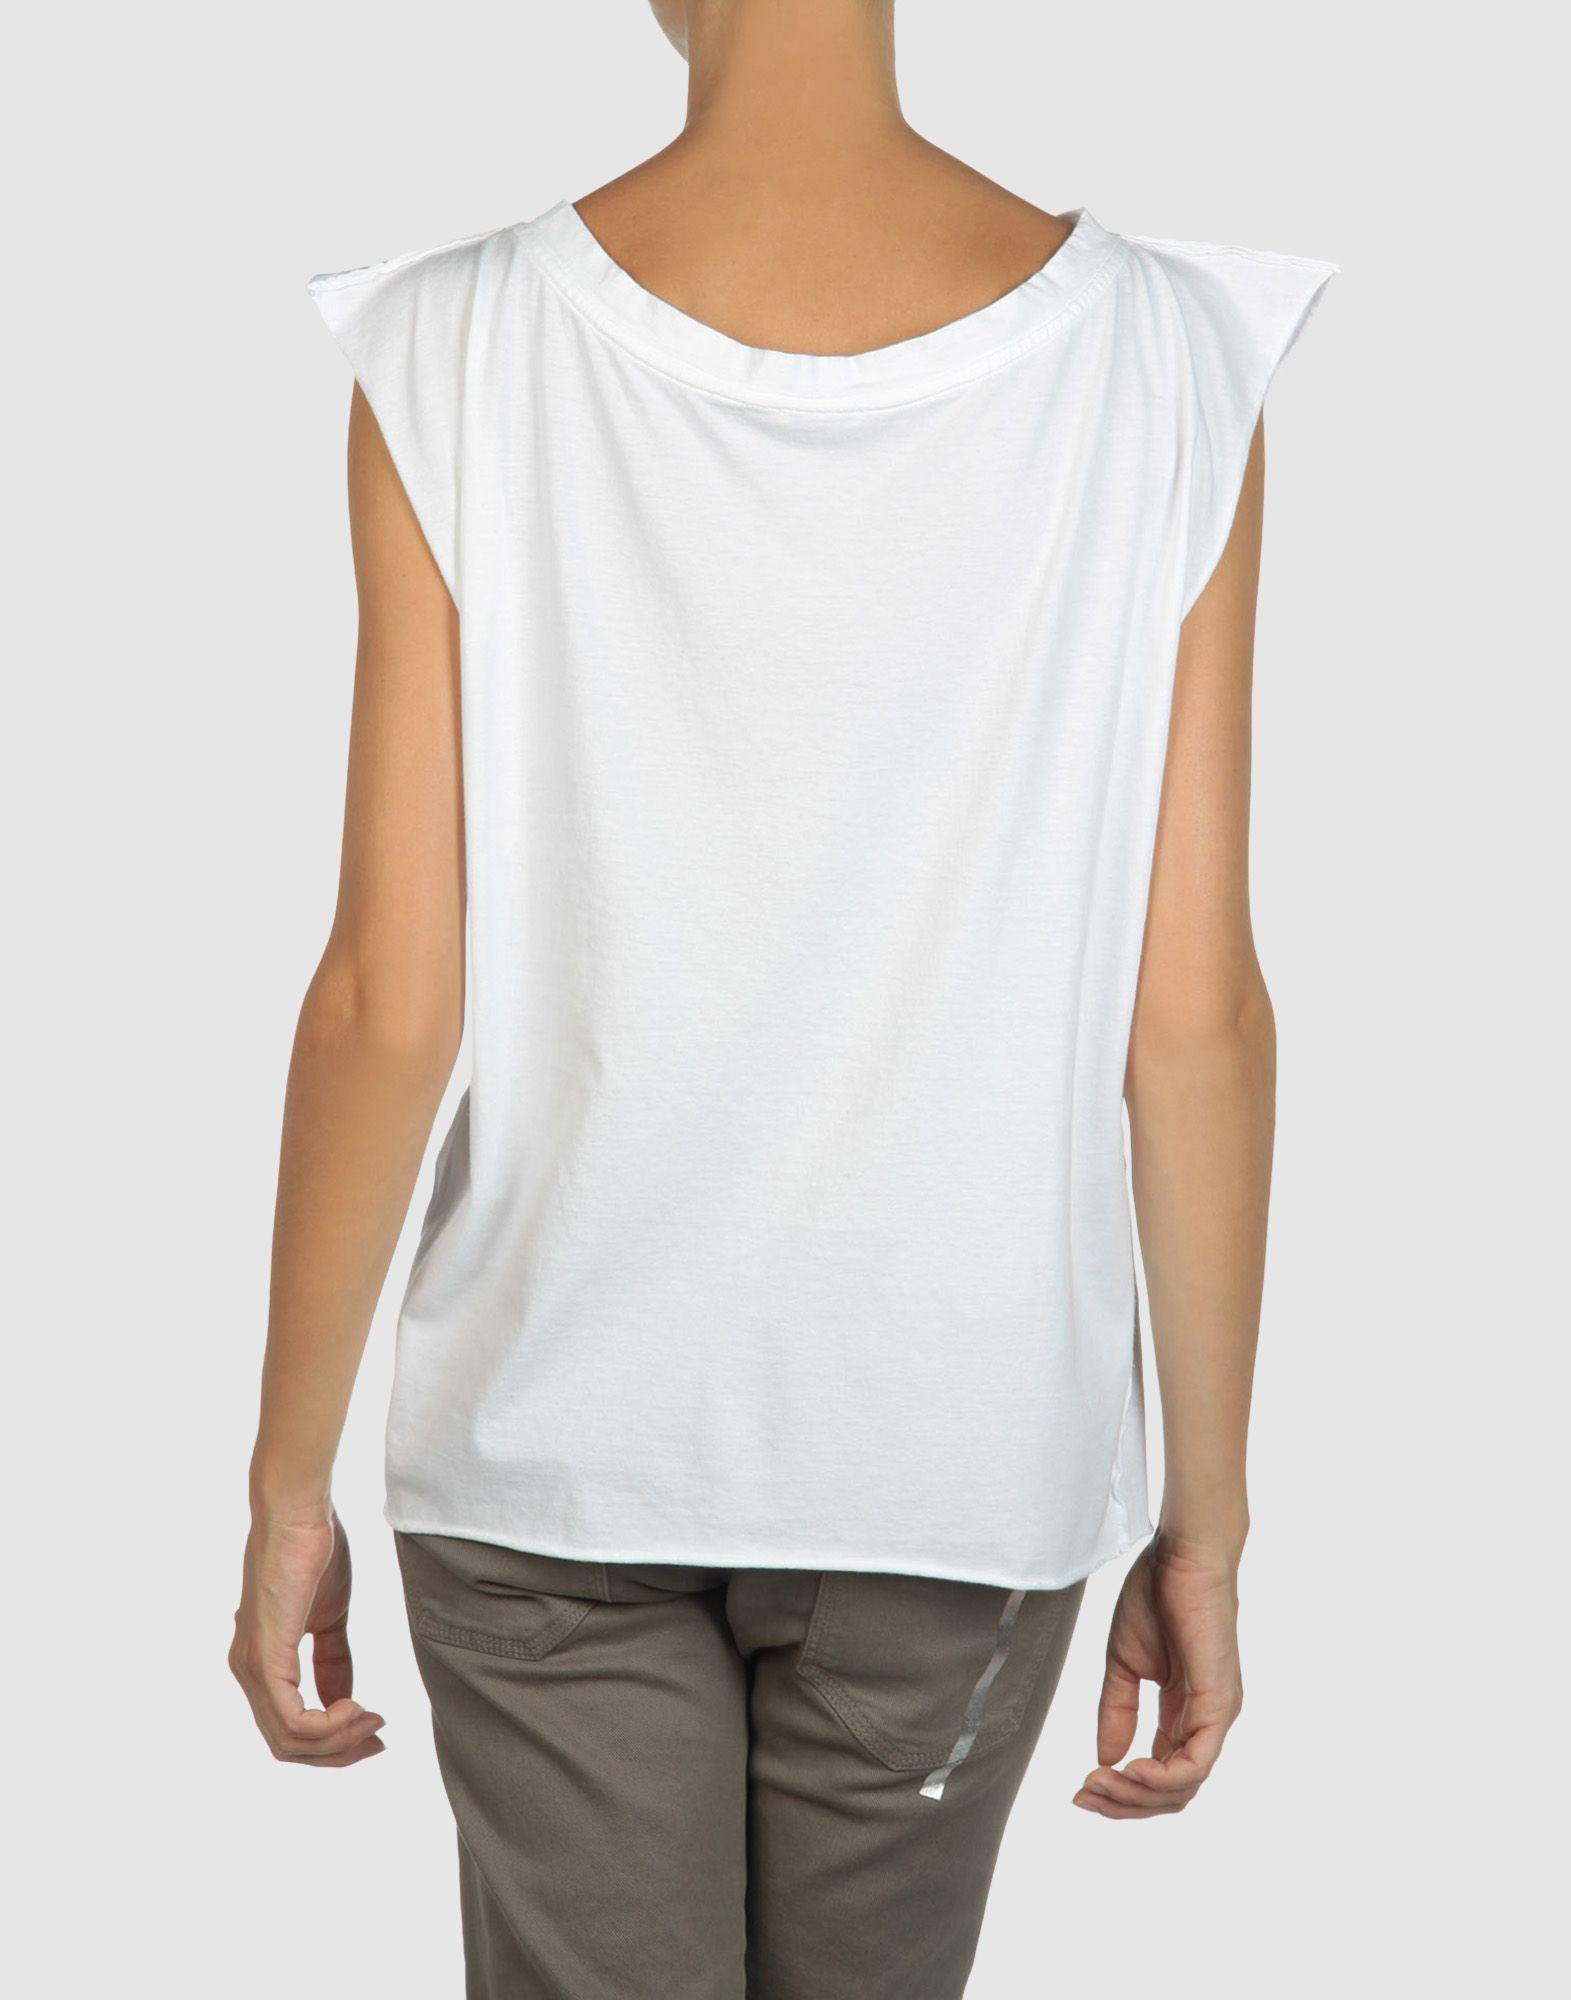 Miu miu sleeveless t shirt in white lyst for Miu miu t shirt